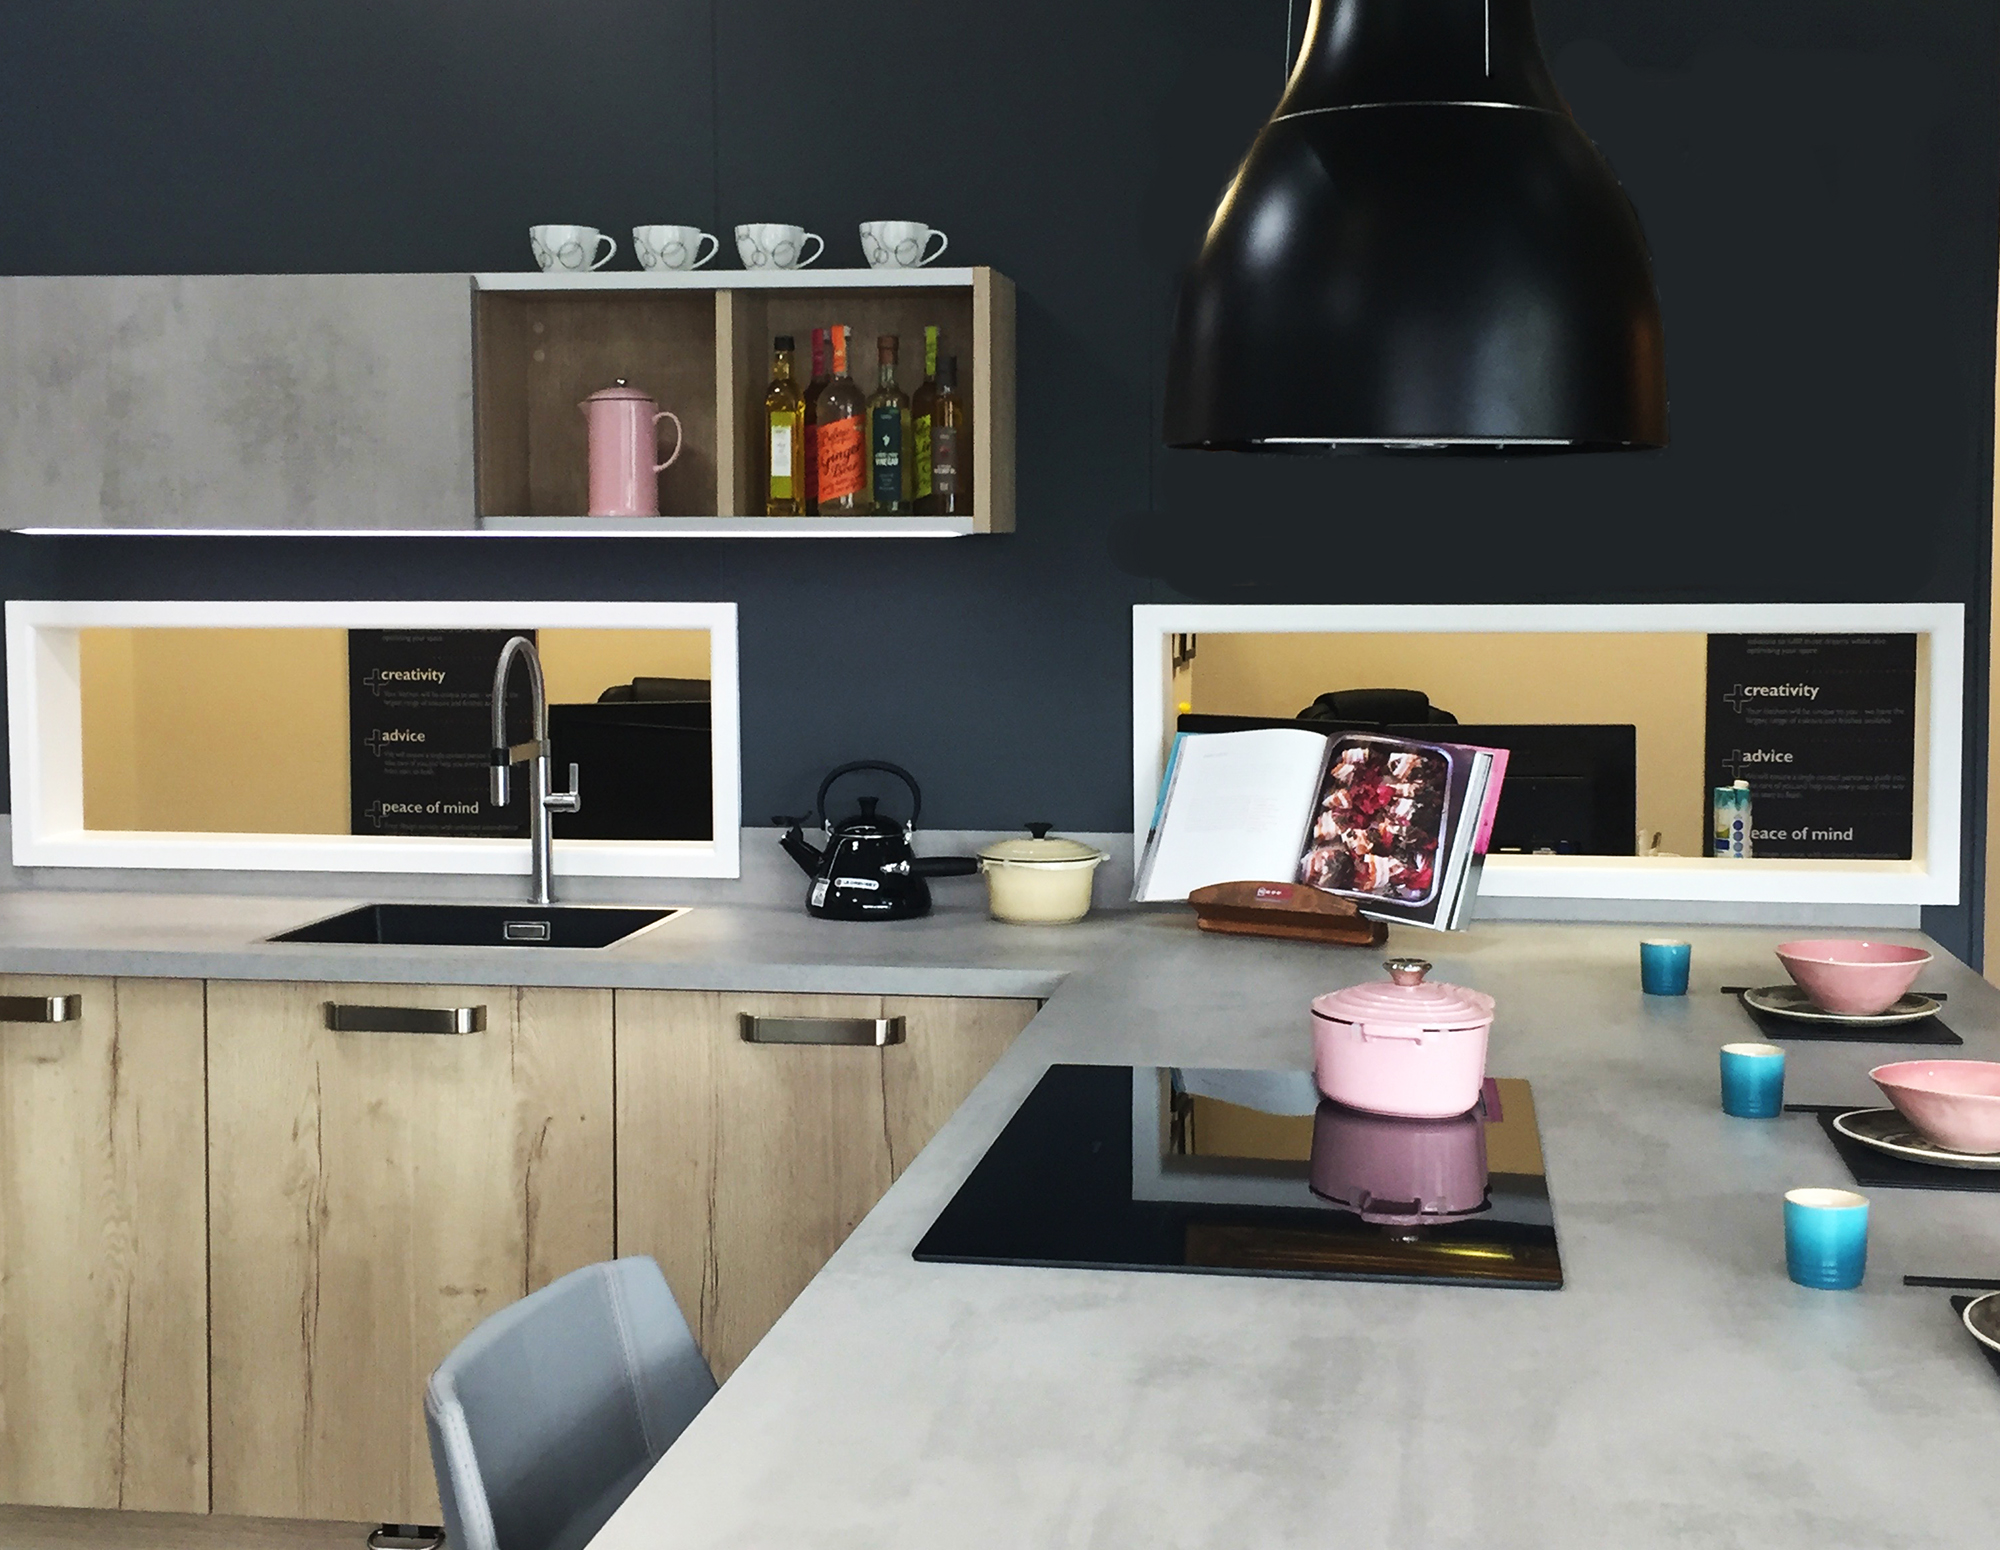 contemporary_kitchen_interior design_soul living_6.jpg